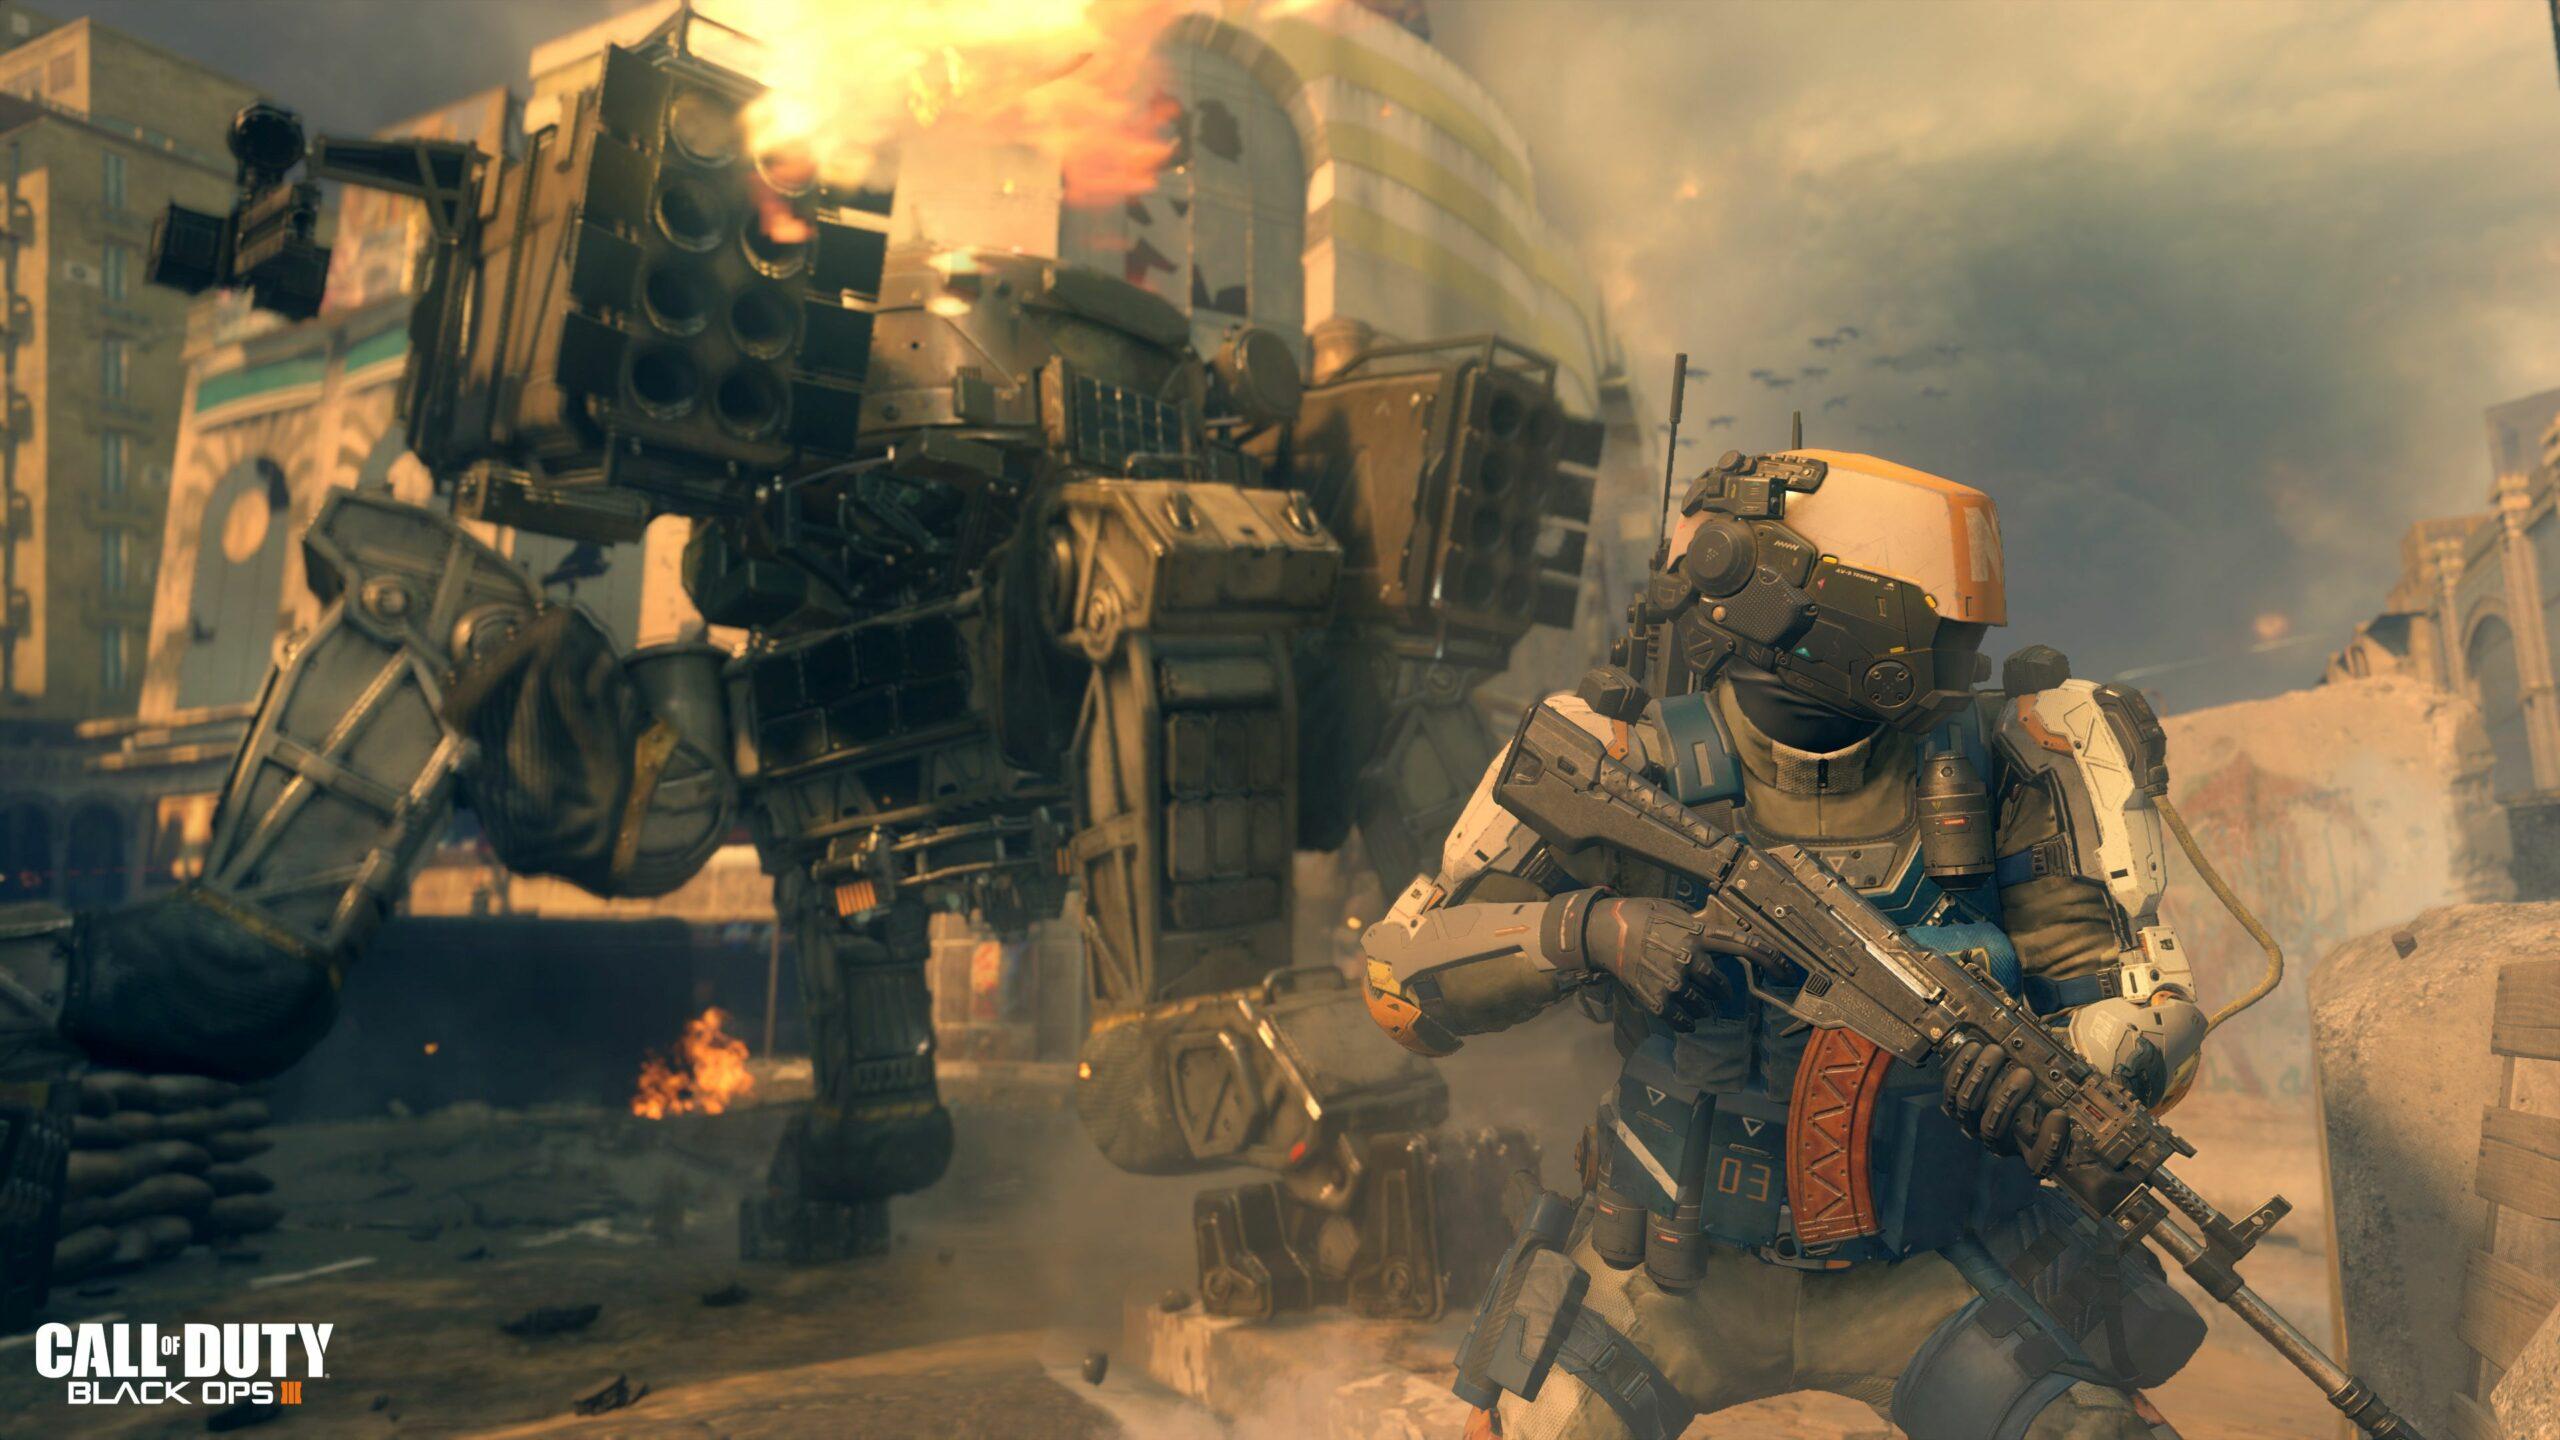 Call-of-Duty-Black-Ops-III_2015_04-26-15_005